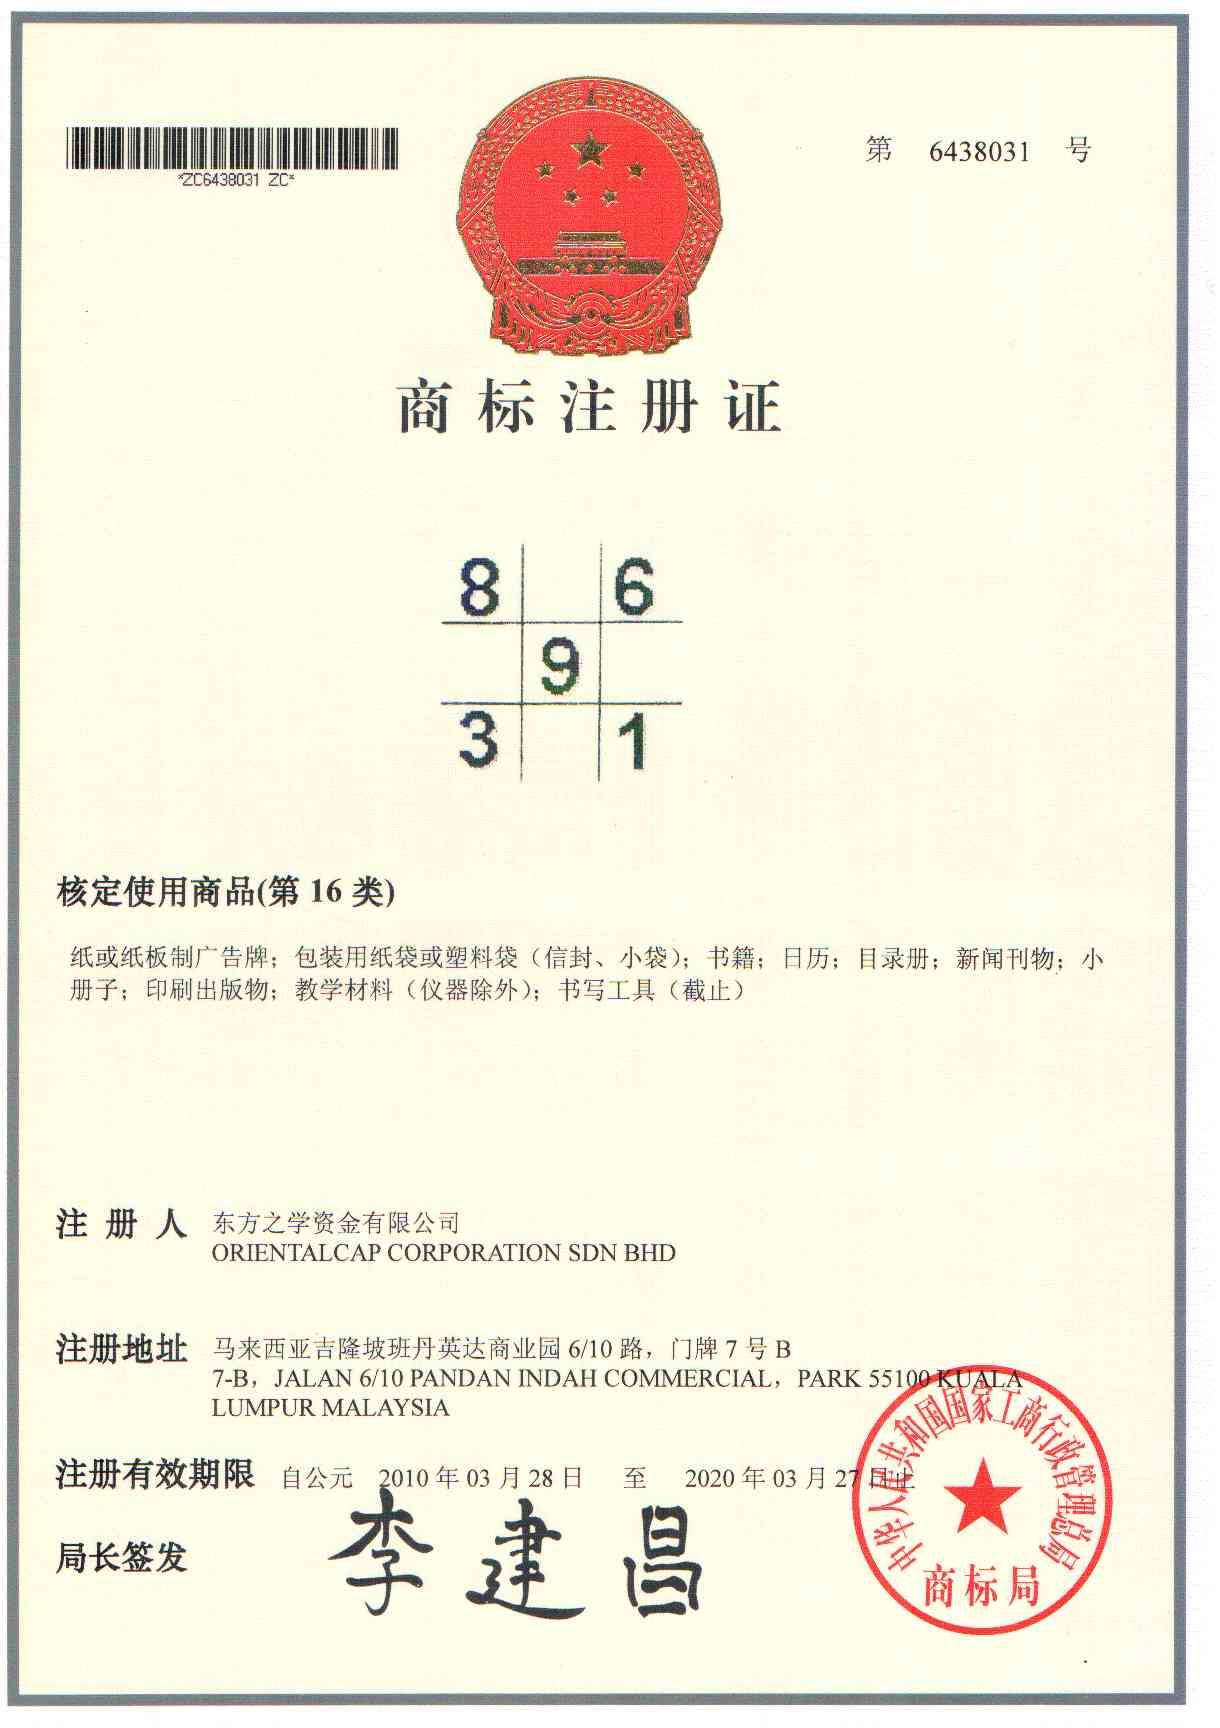 OMC 13689 Trademark